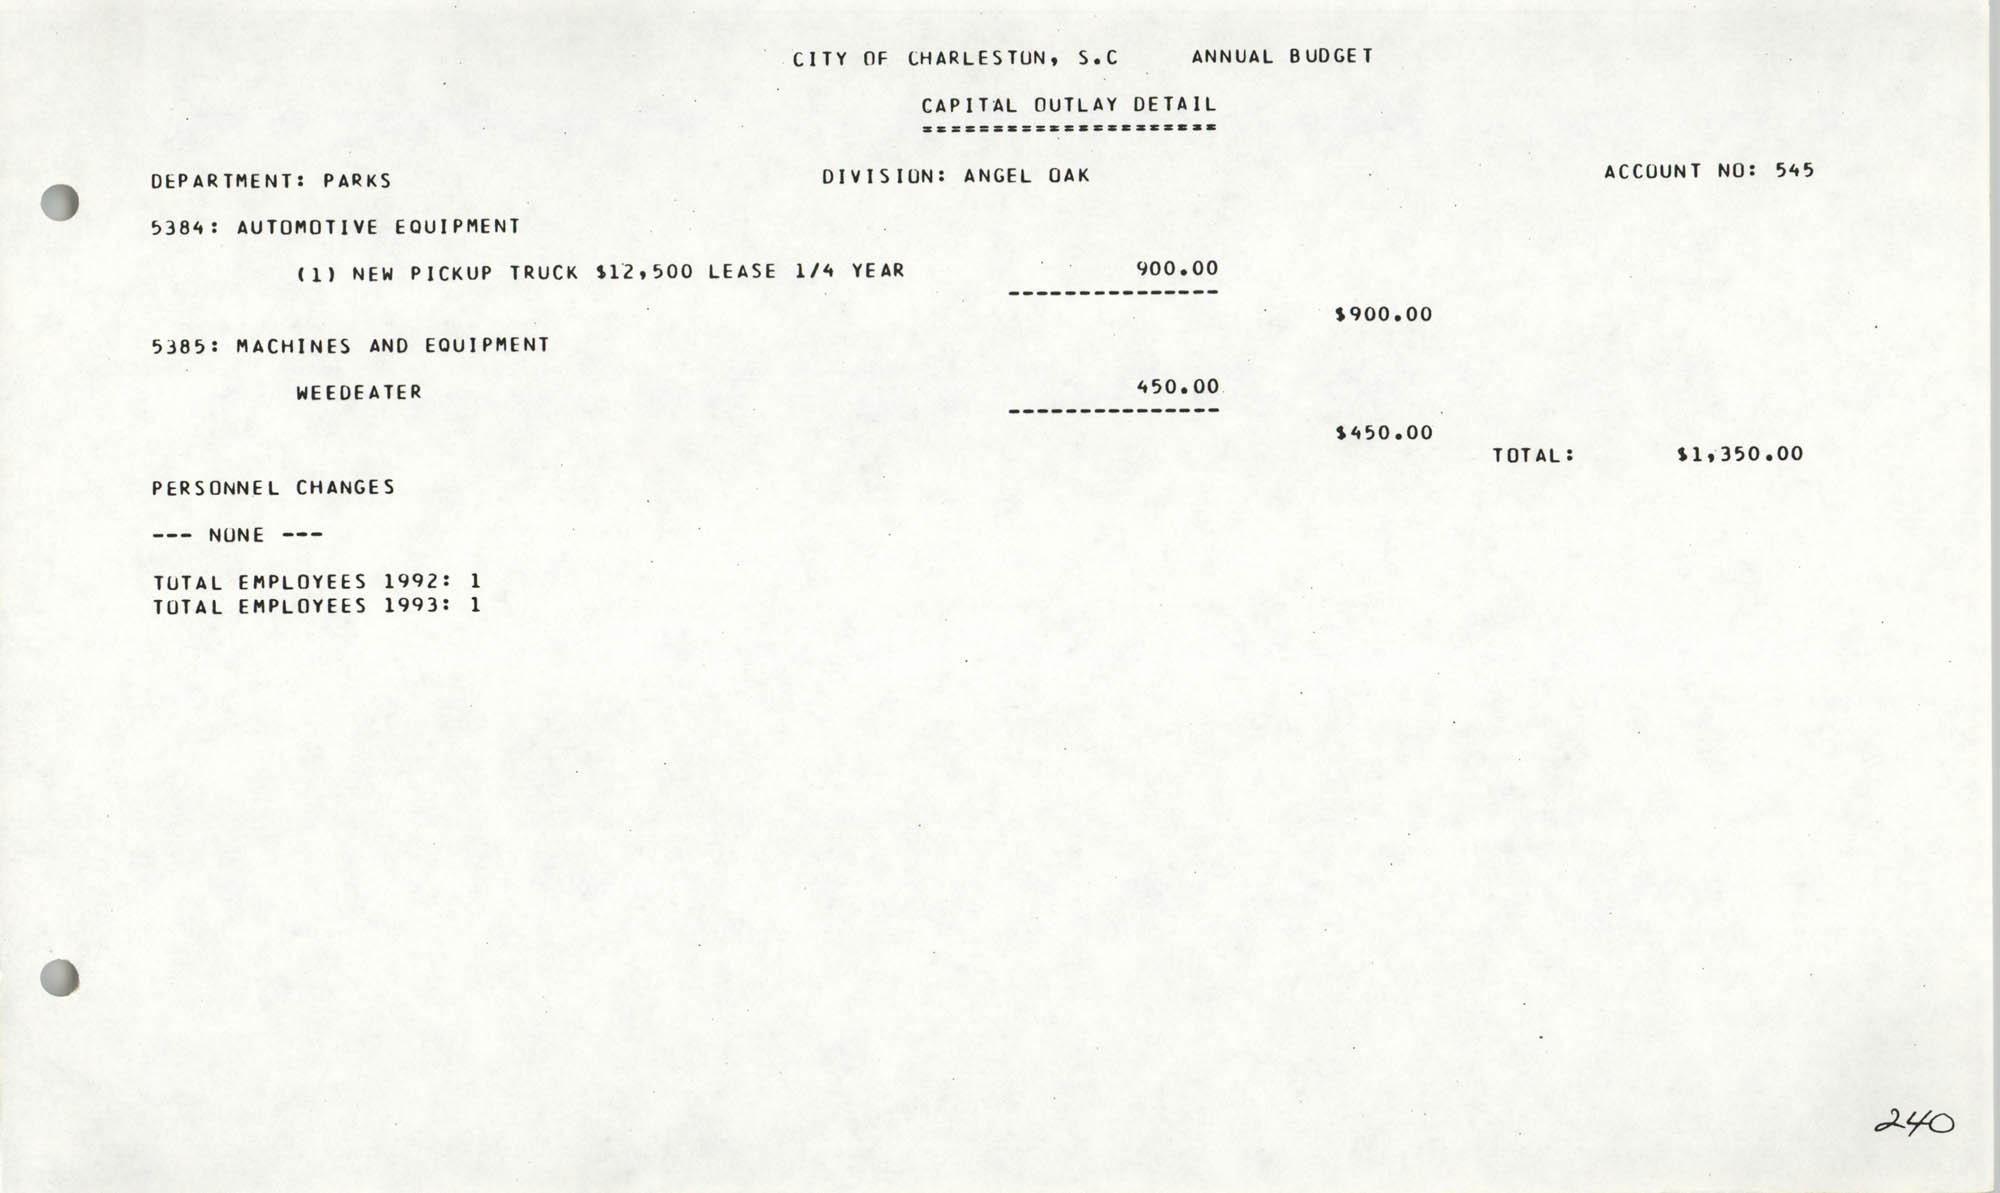 The City Council of Charleston, South Carolina, 1993 Budget, Page 240